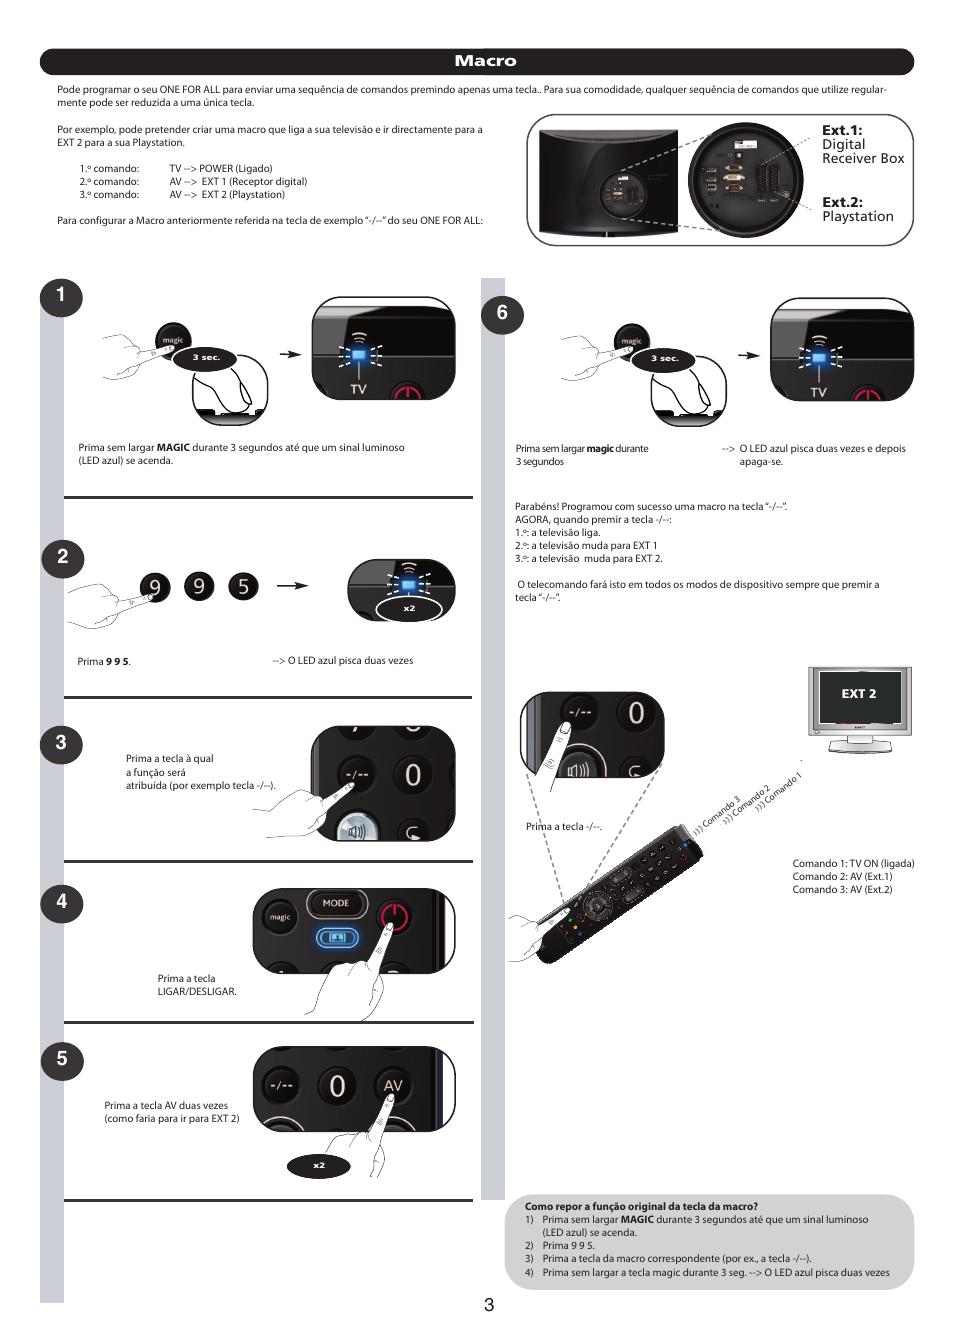 macro ext 1 digital receiver box ext 2 playstation one for all rh manualsdir com one for all urc 3440 user manual one for all urc-3410 user manual